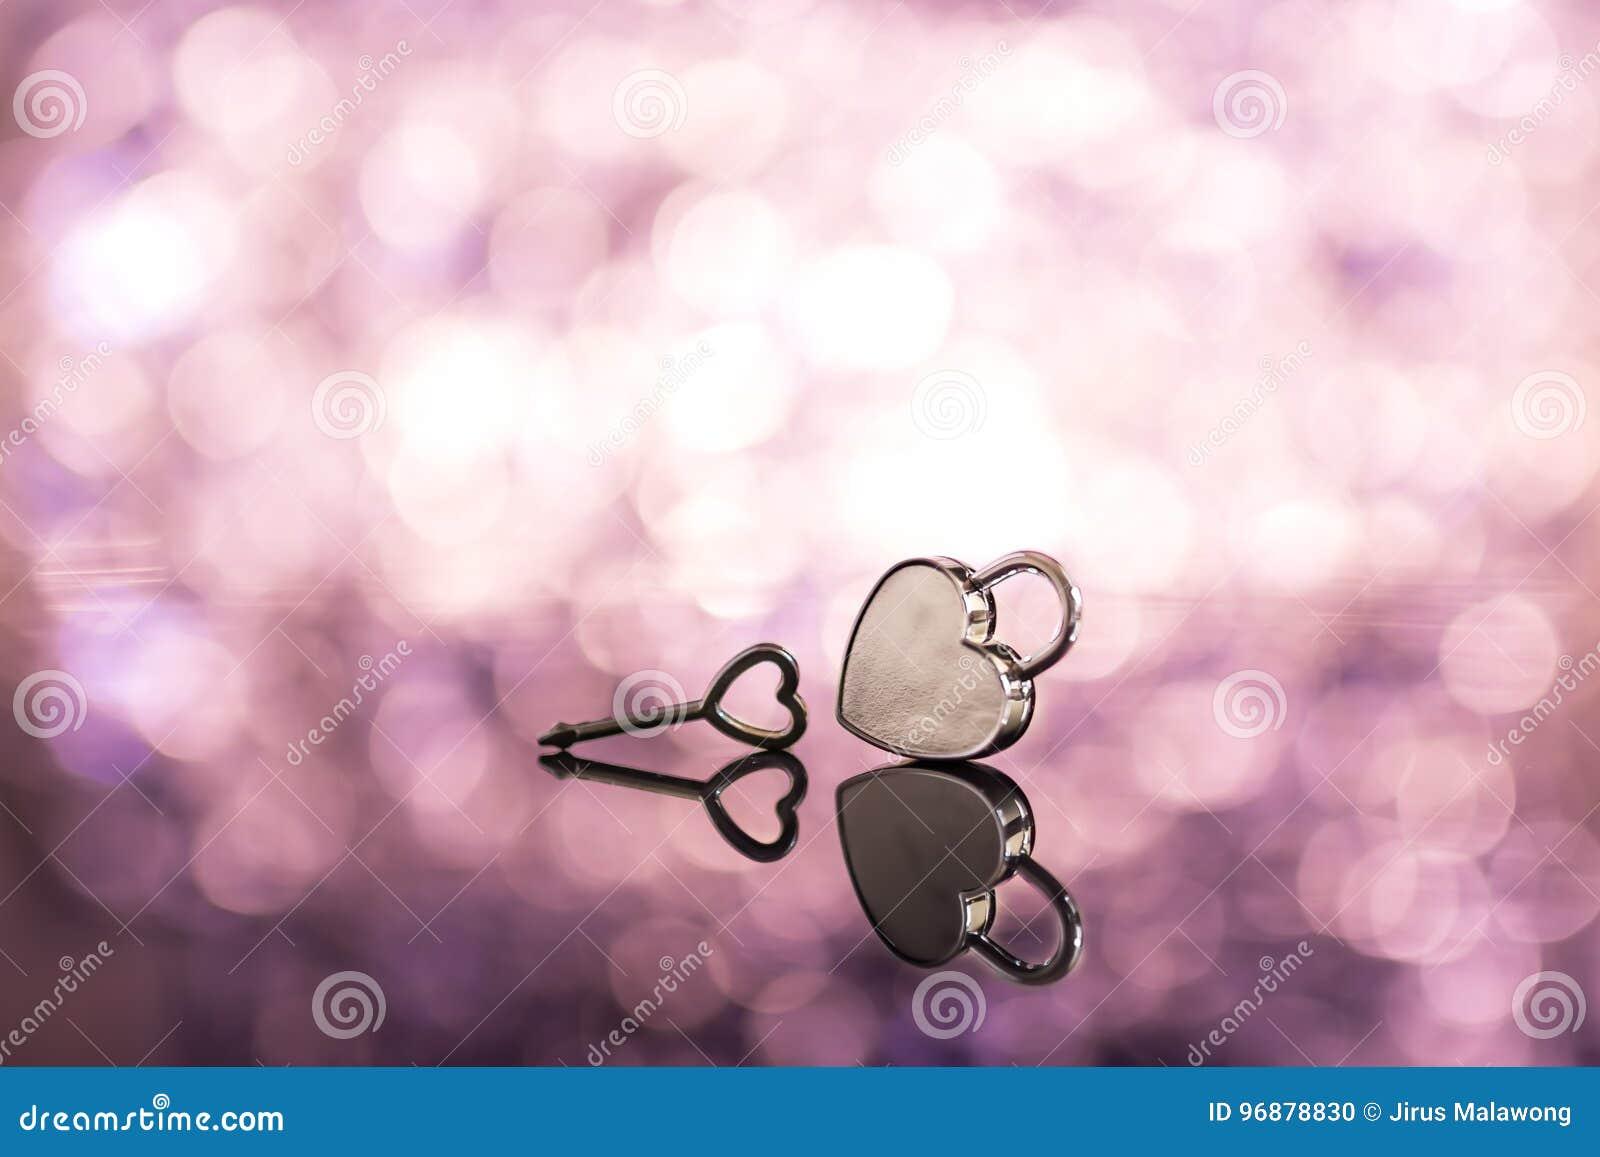 Сияющий замок и ключ сердца металла в розовом backgroun света и bokeh